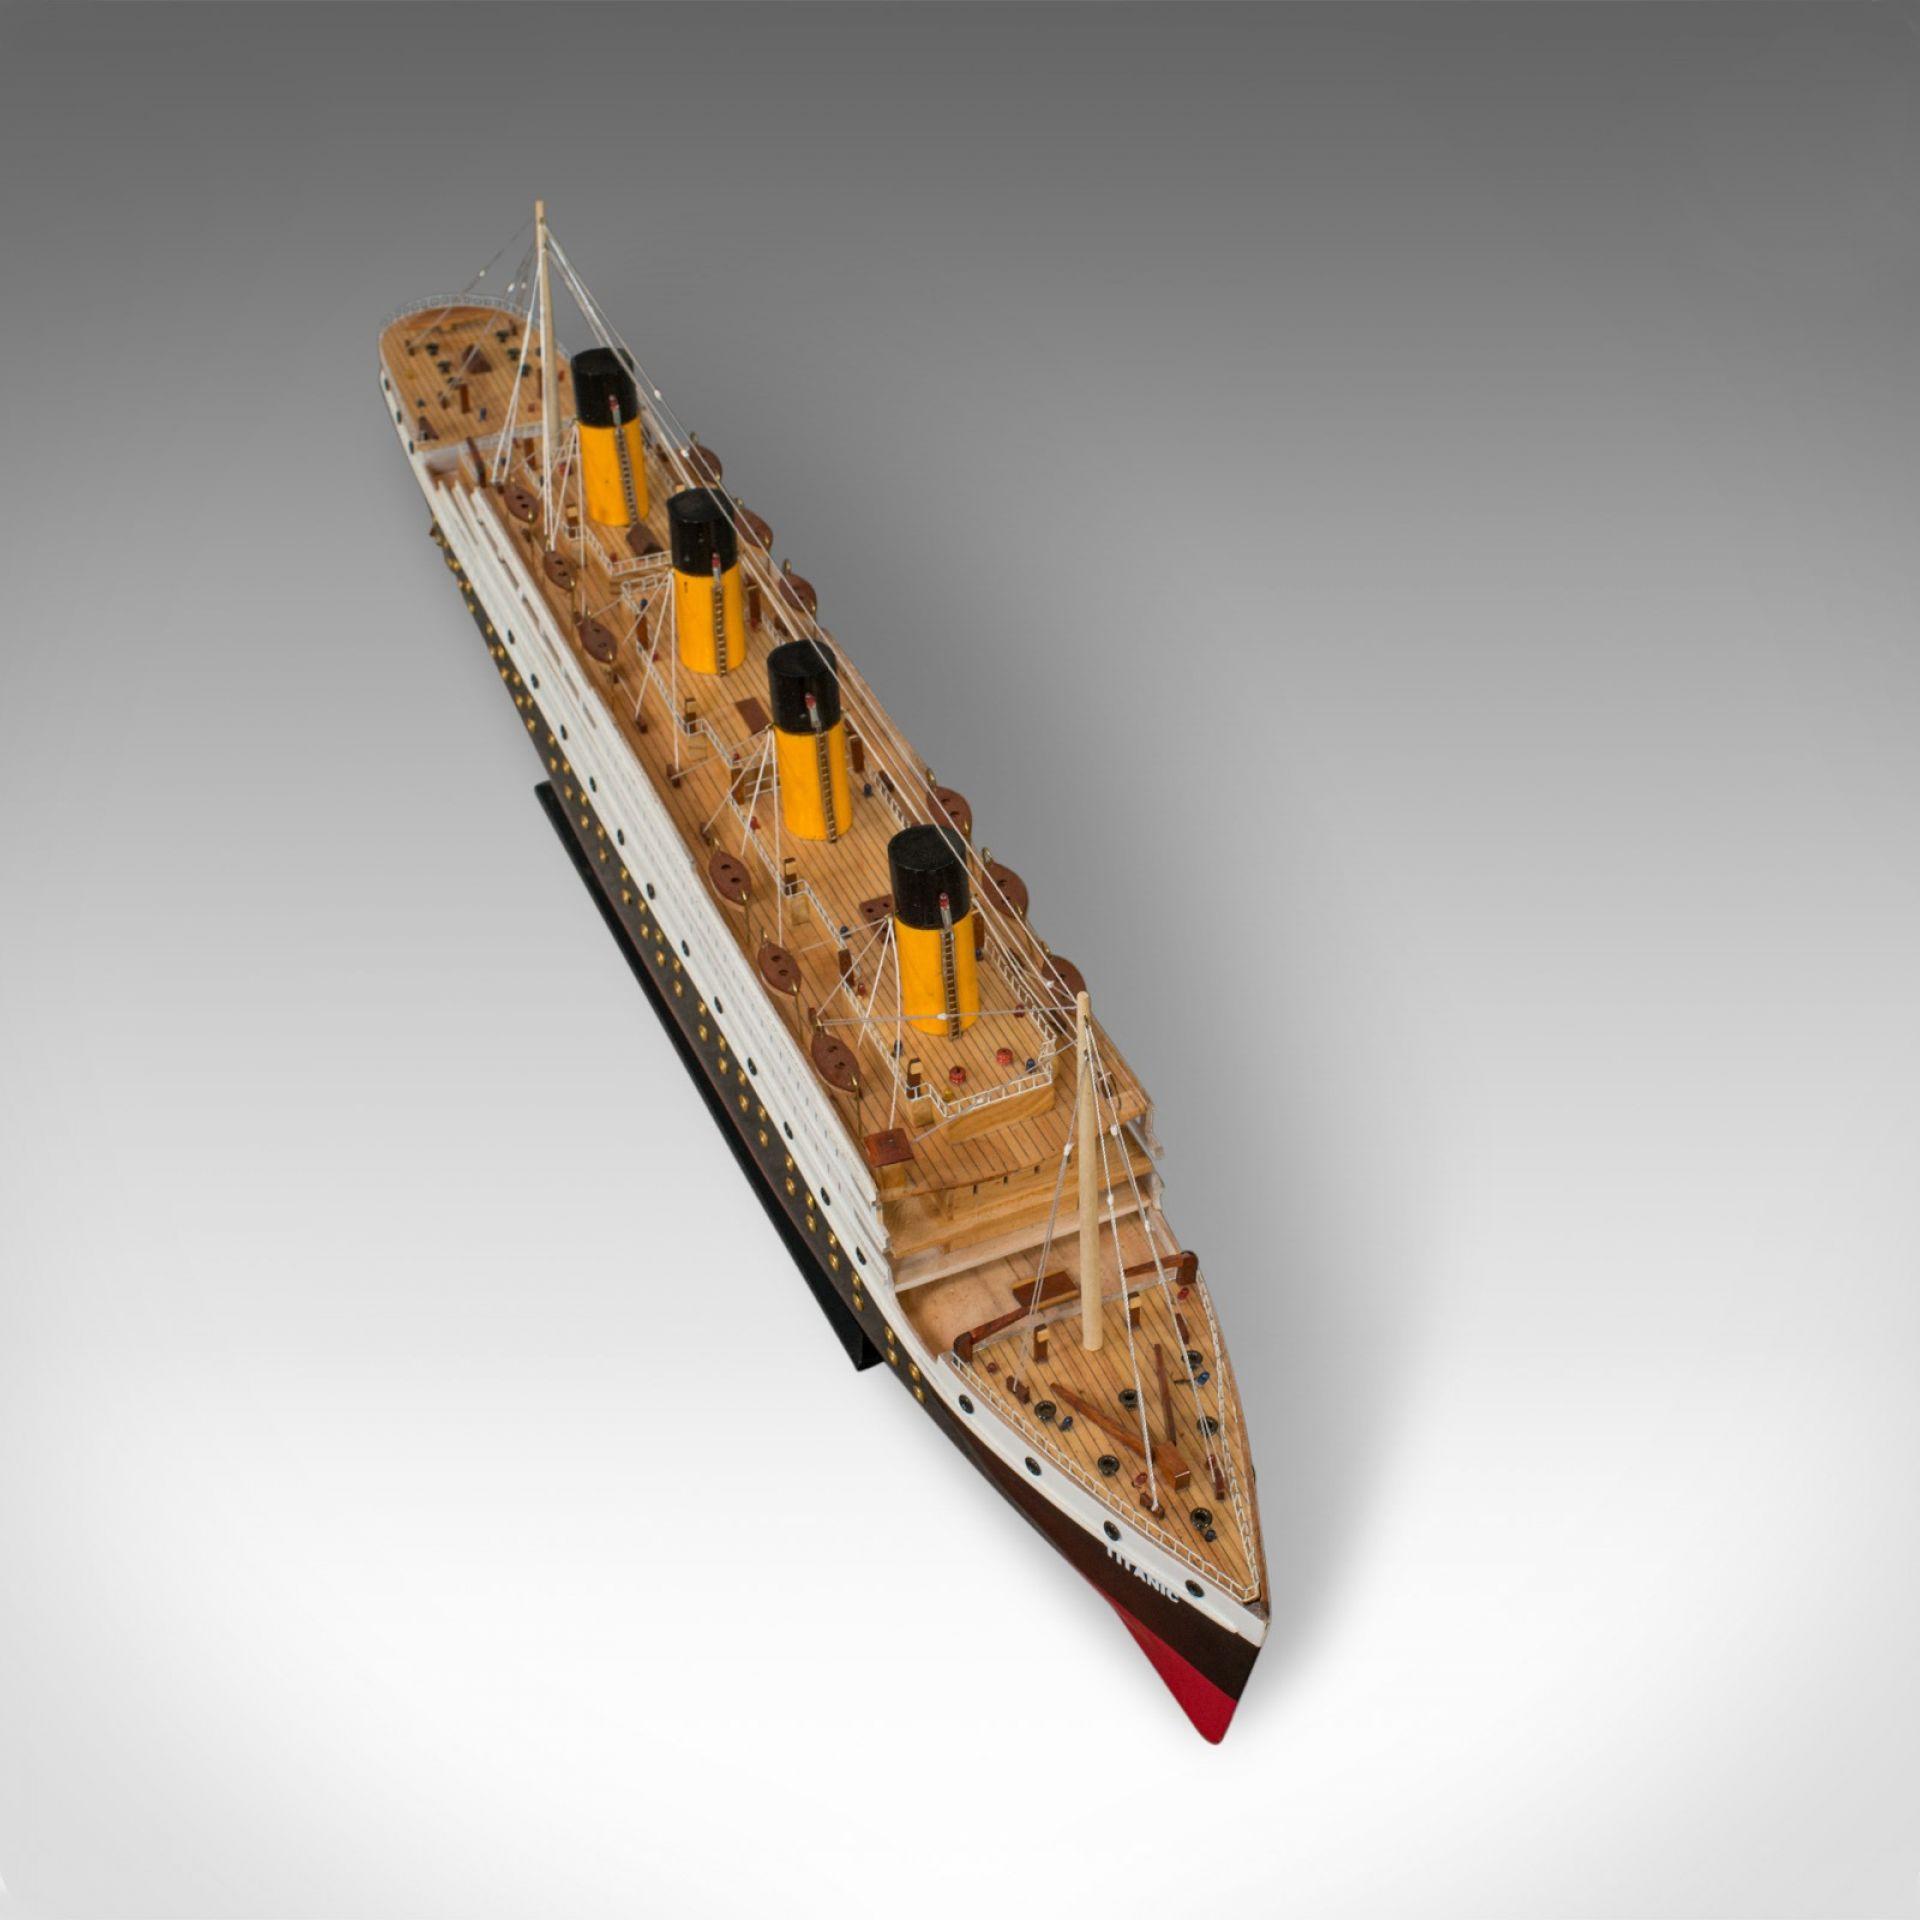 Large Vintage Model Titanic, English, Collectible, Model, Ship, Display, Lights